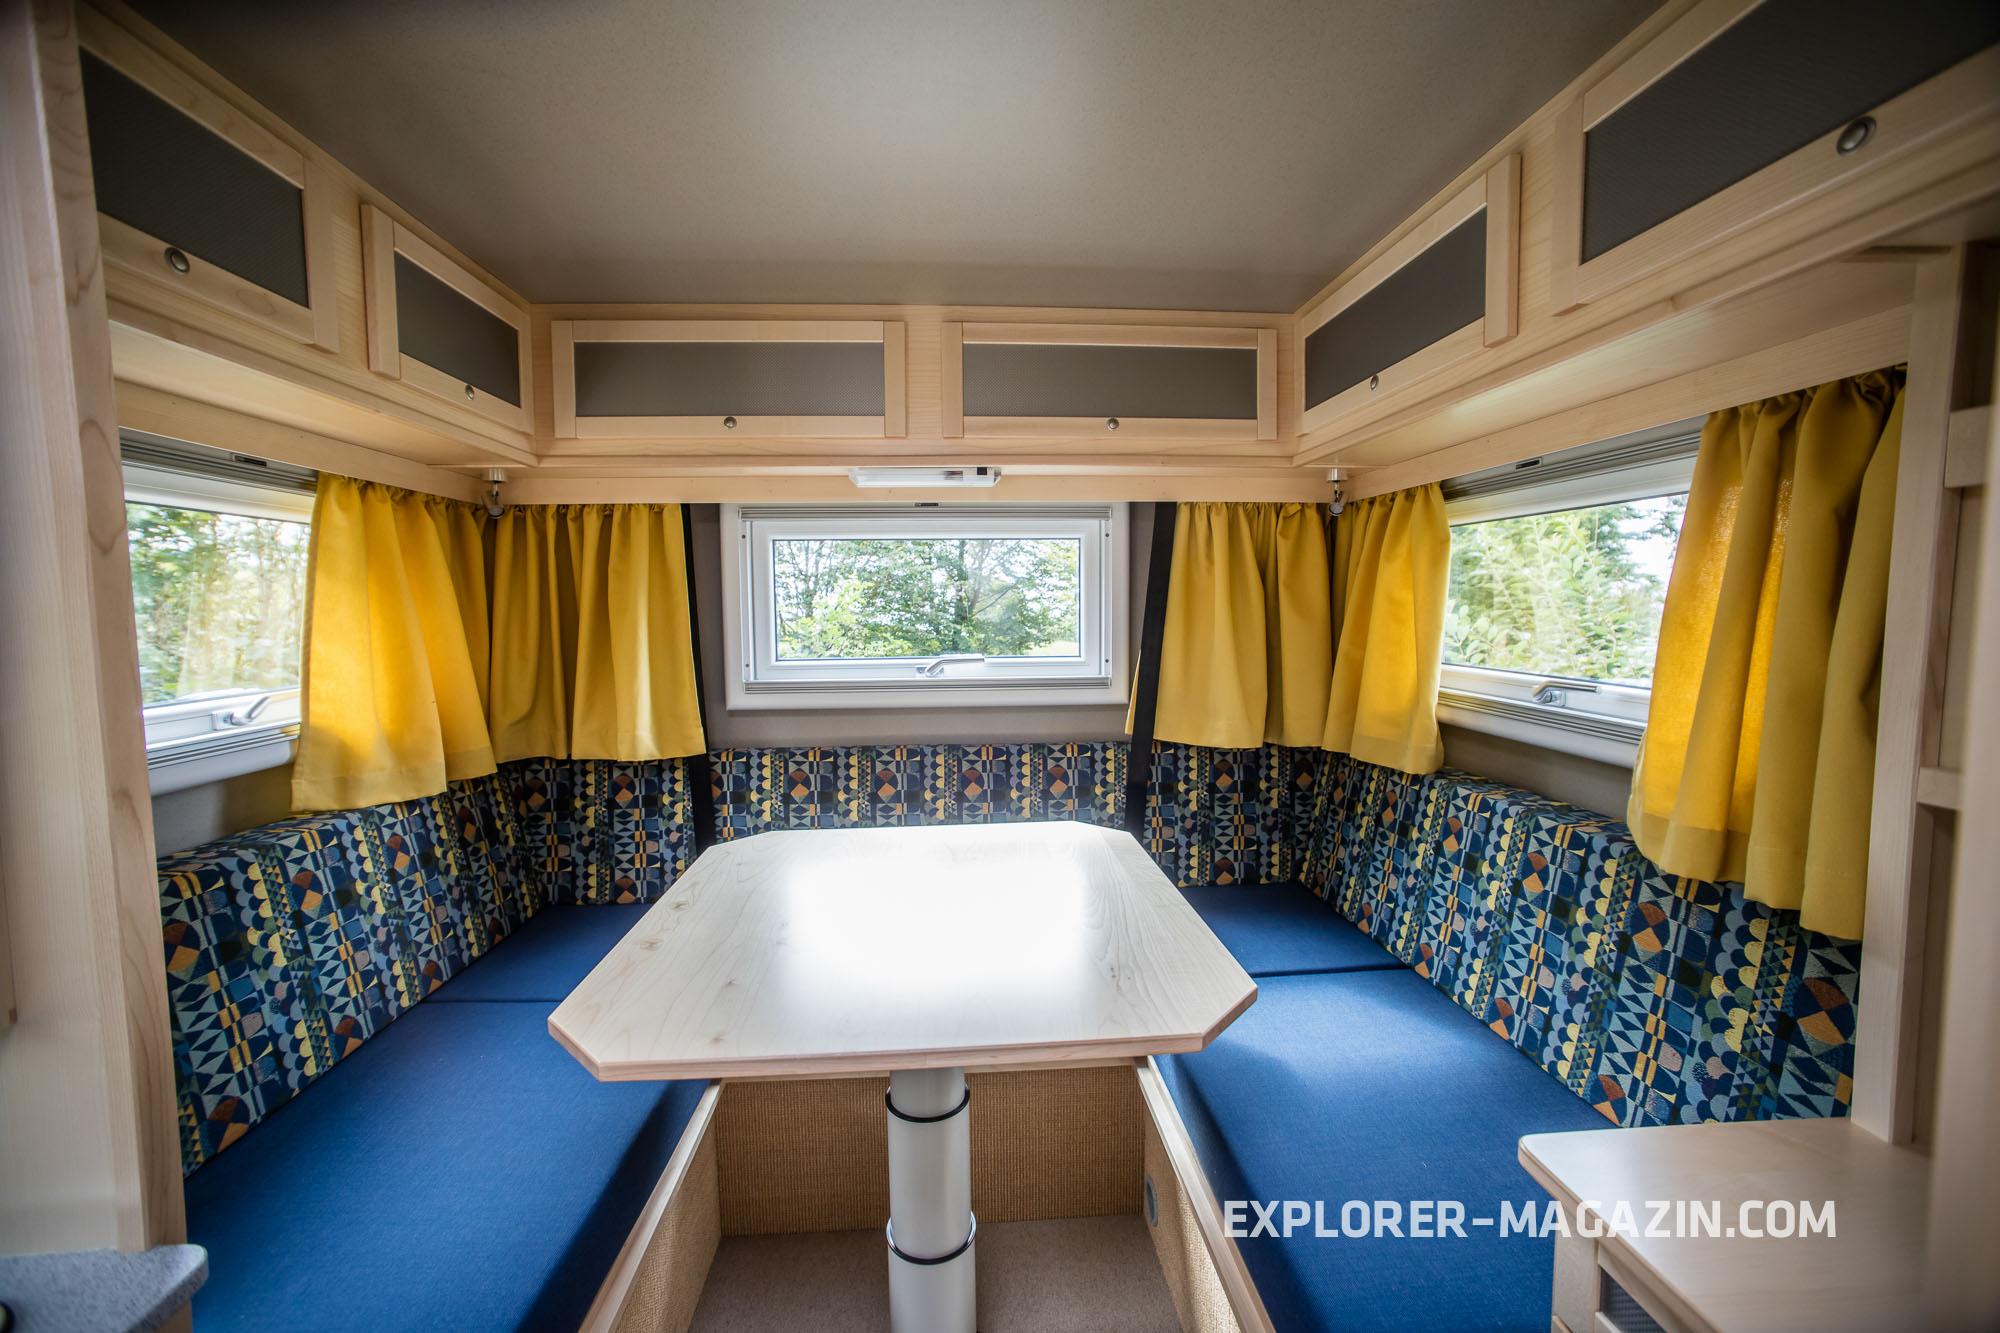 bessere alternative zu schweiz casino august 2018 rolling stones fan club. Black Bedroom Furniture Sets. Home Design Ideas